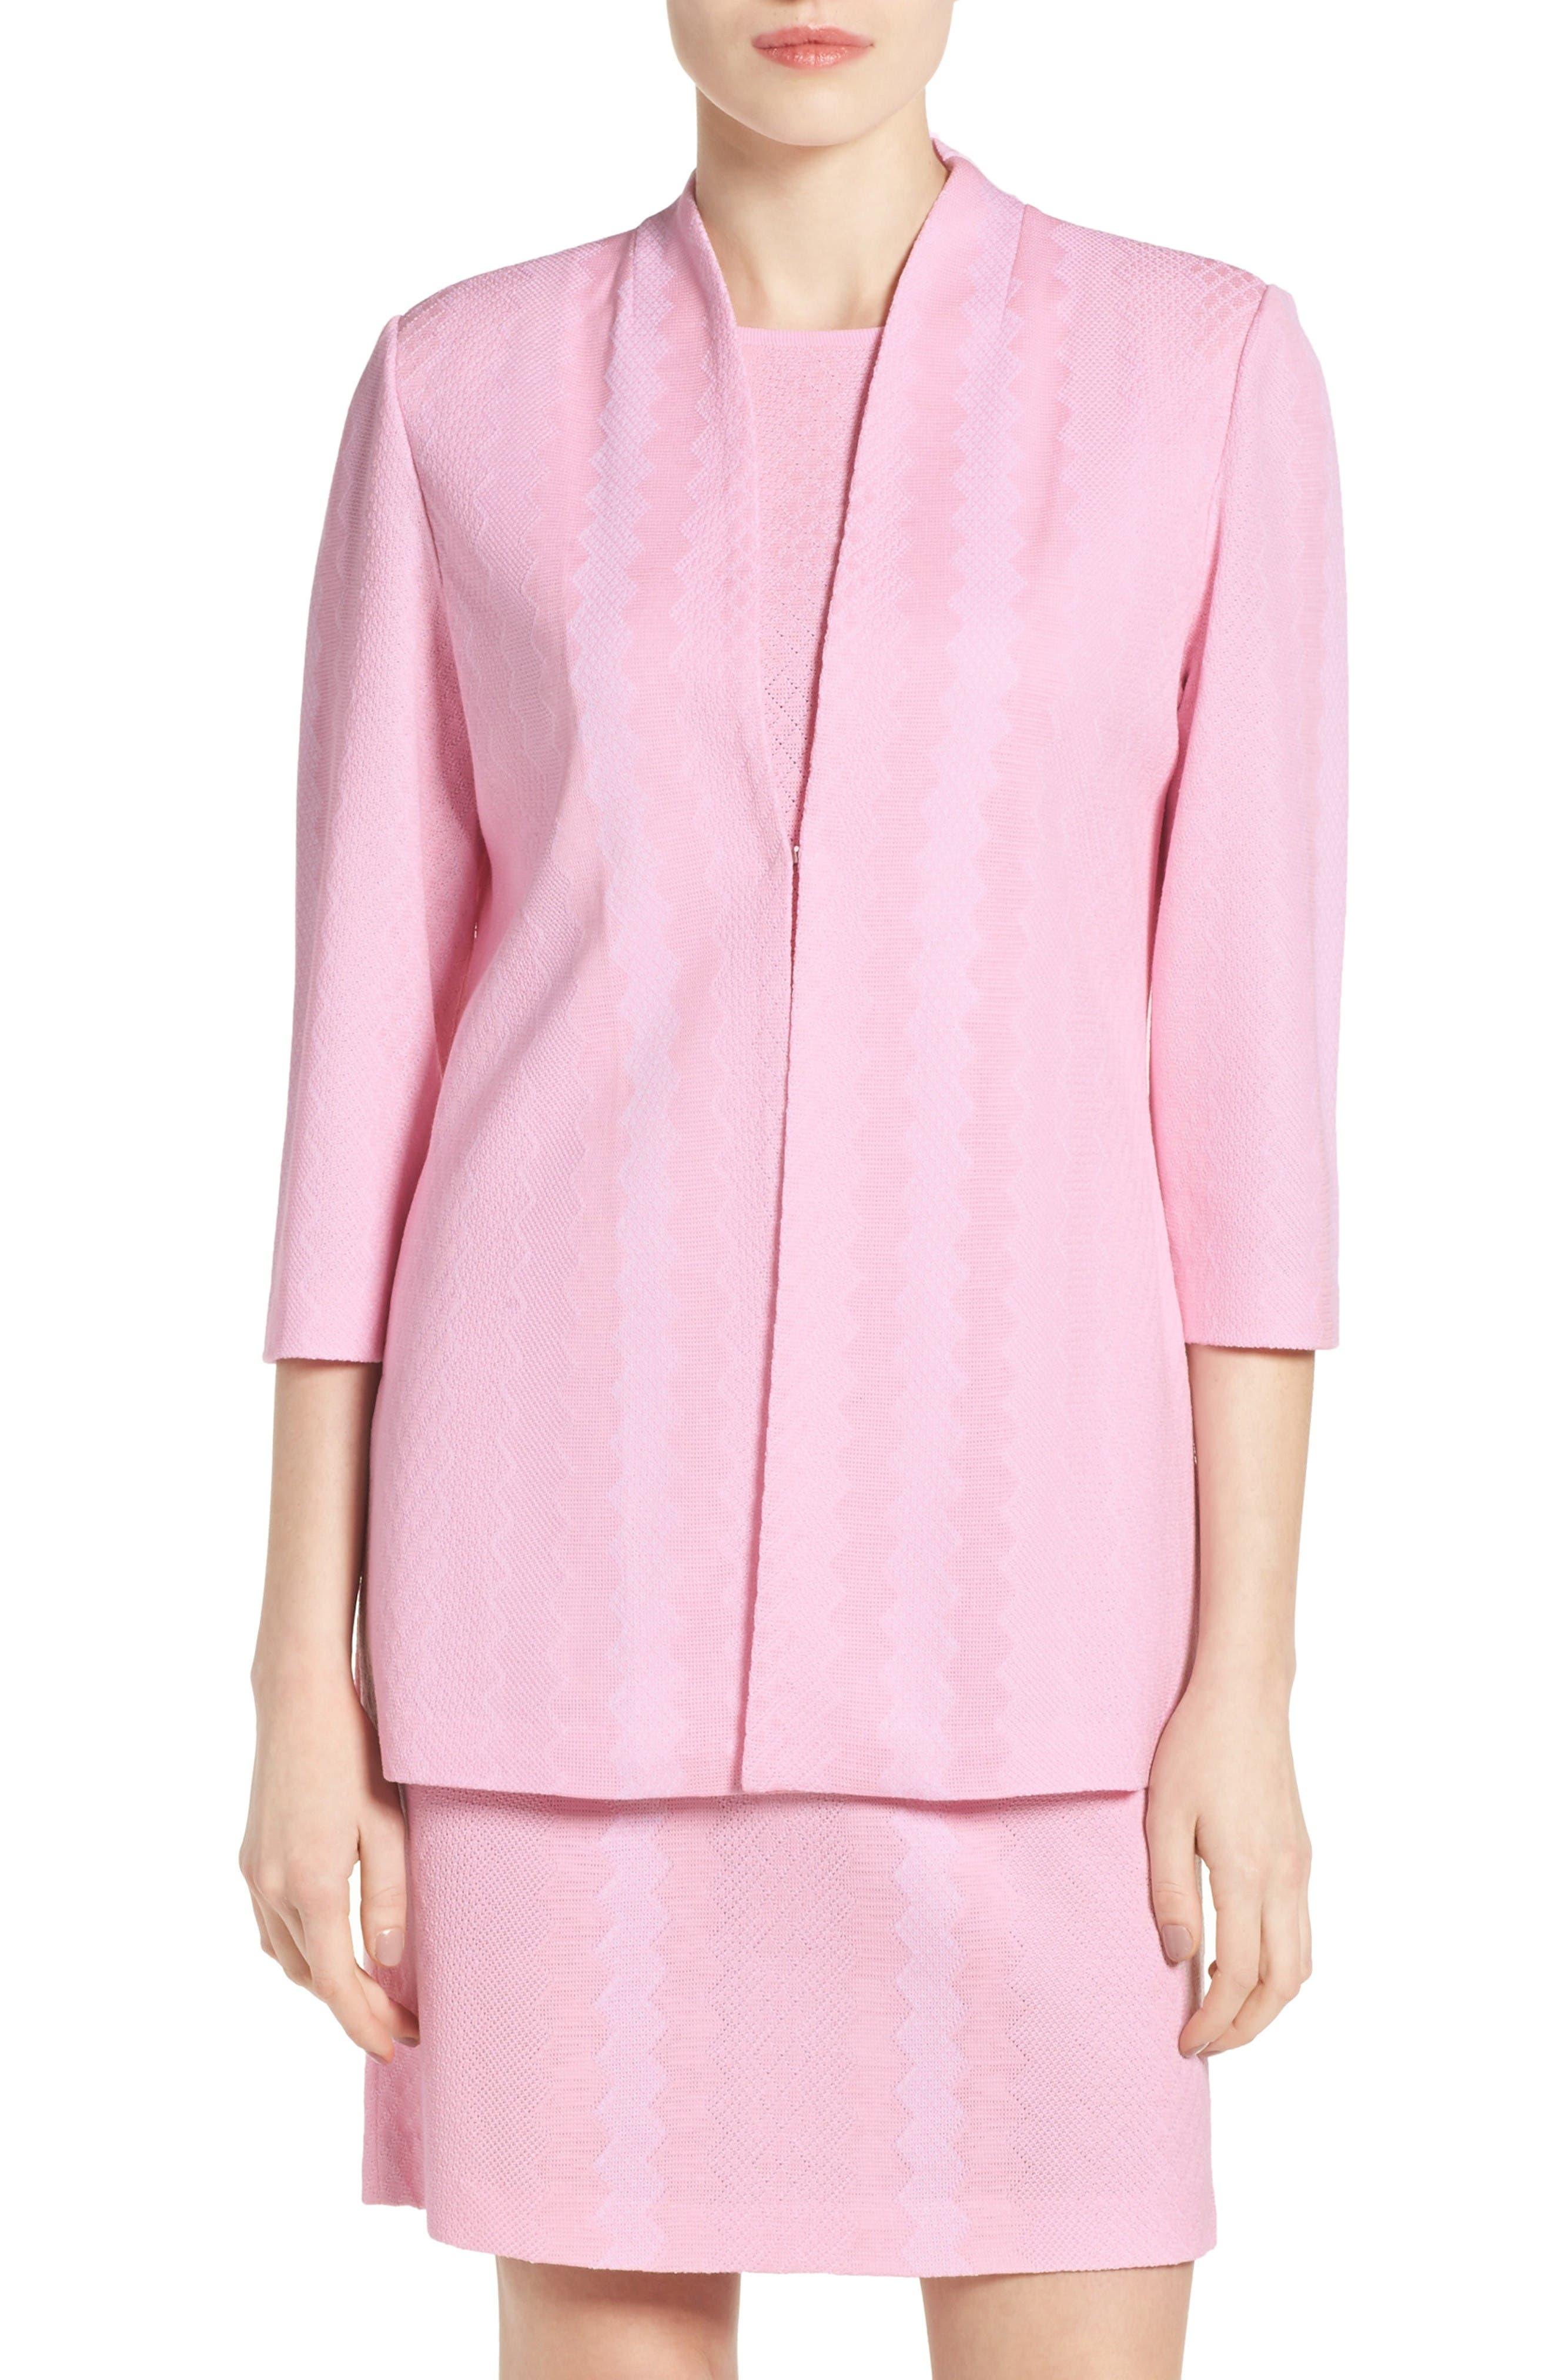 MING WANG Texture Knit Mandarin Collar Jacket